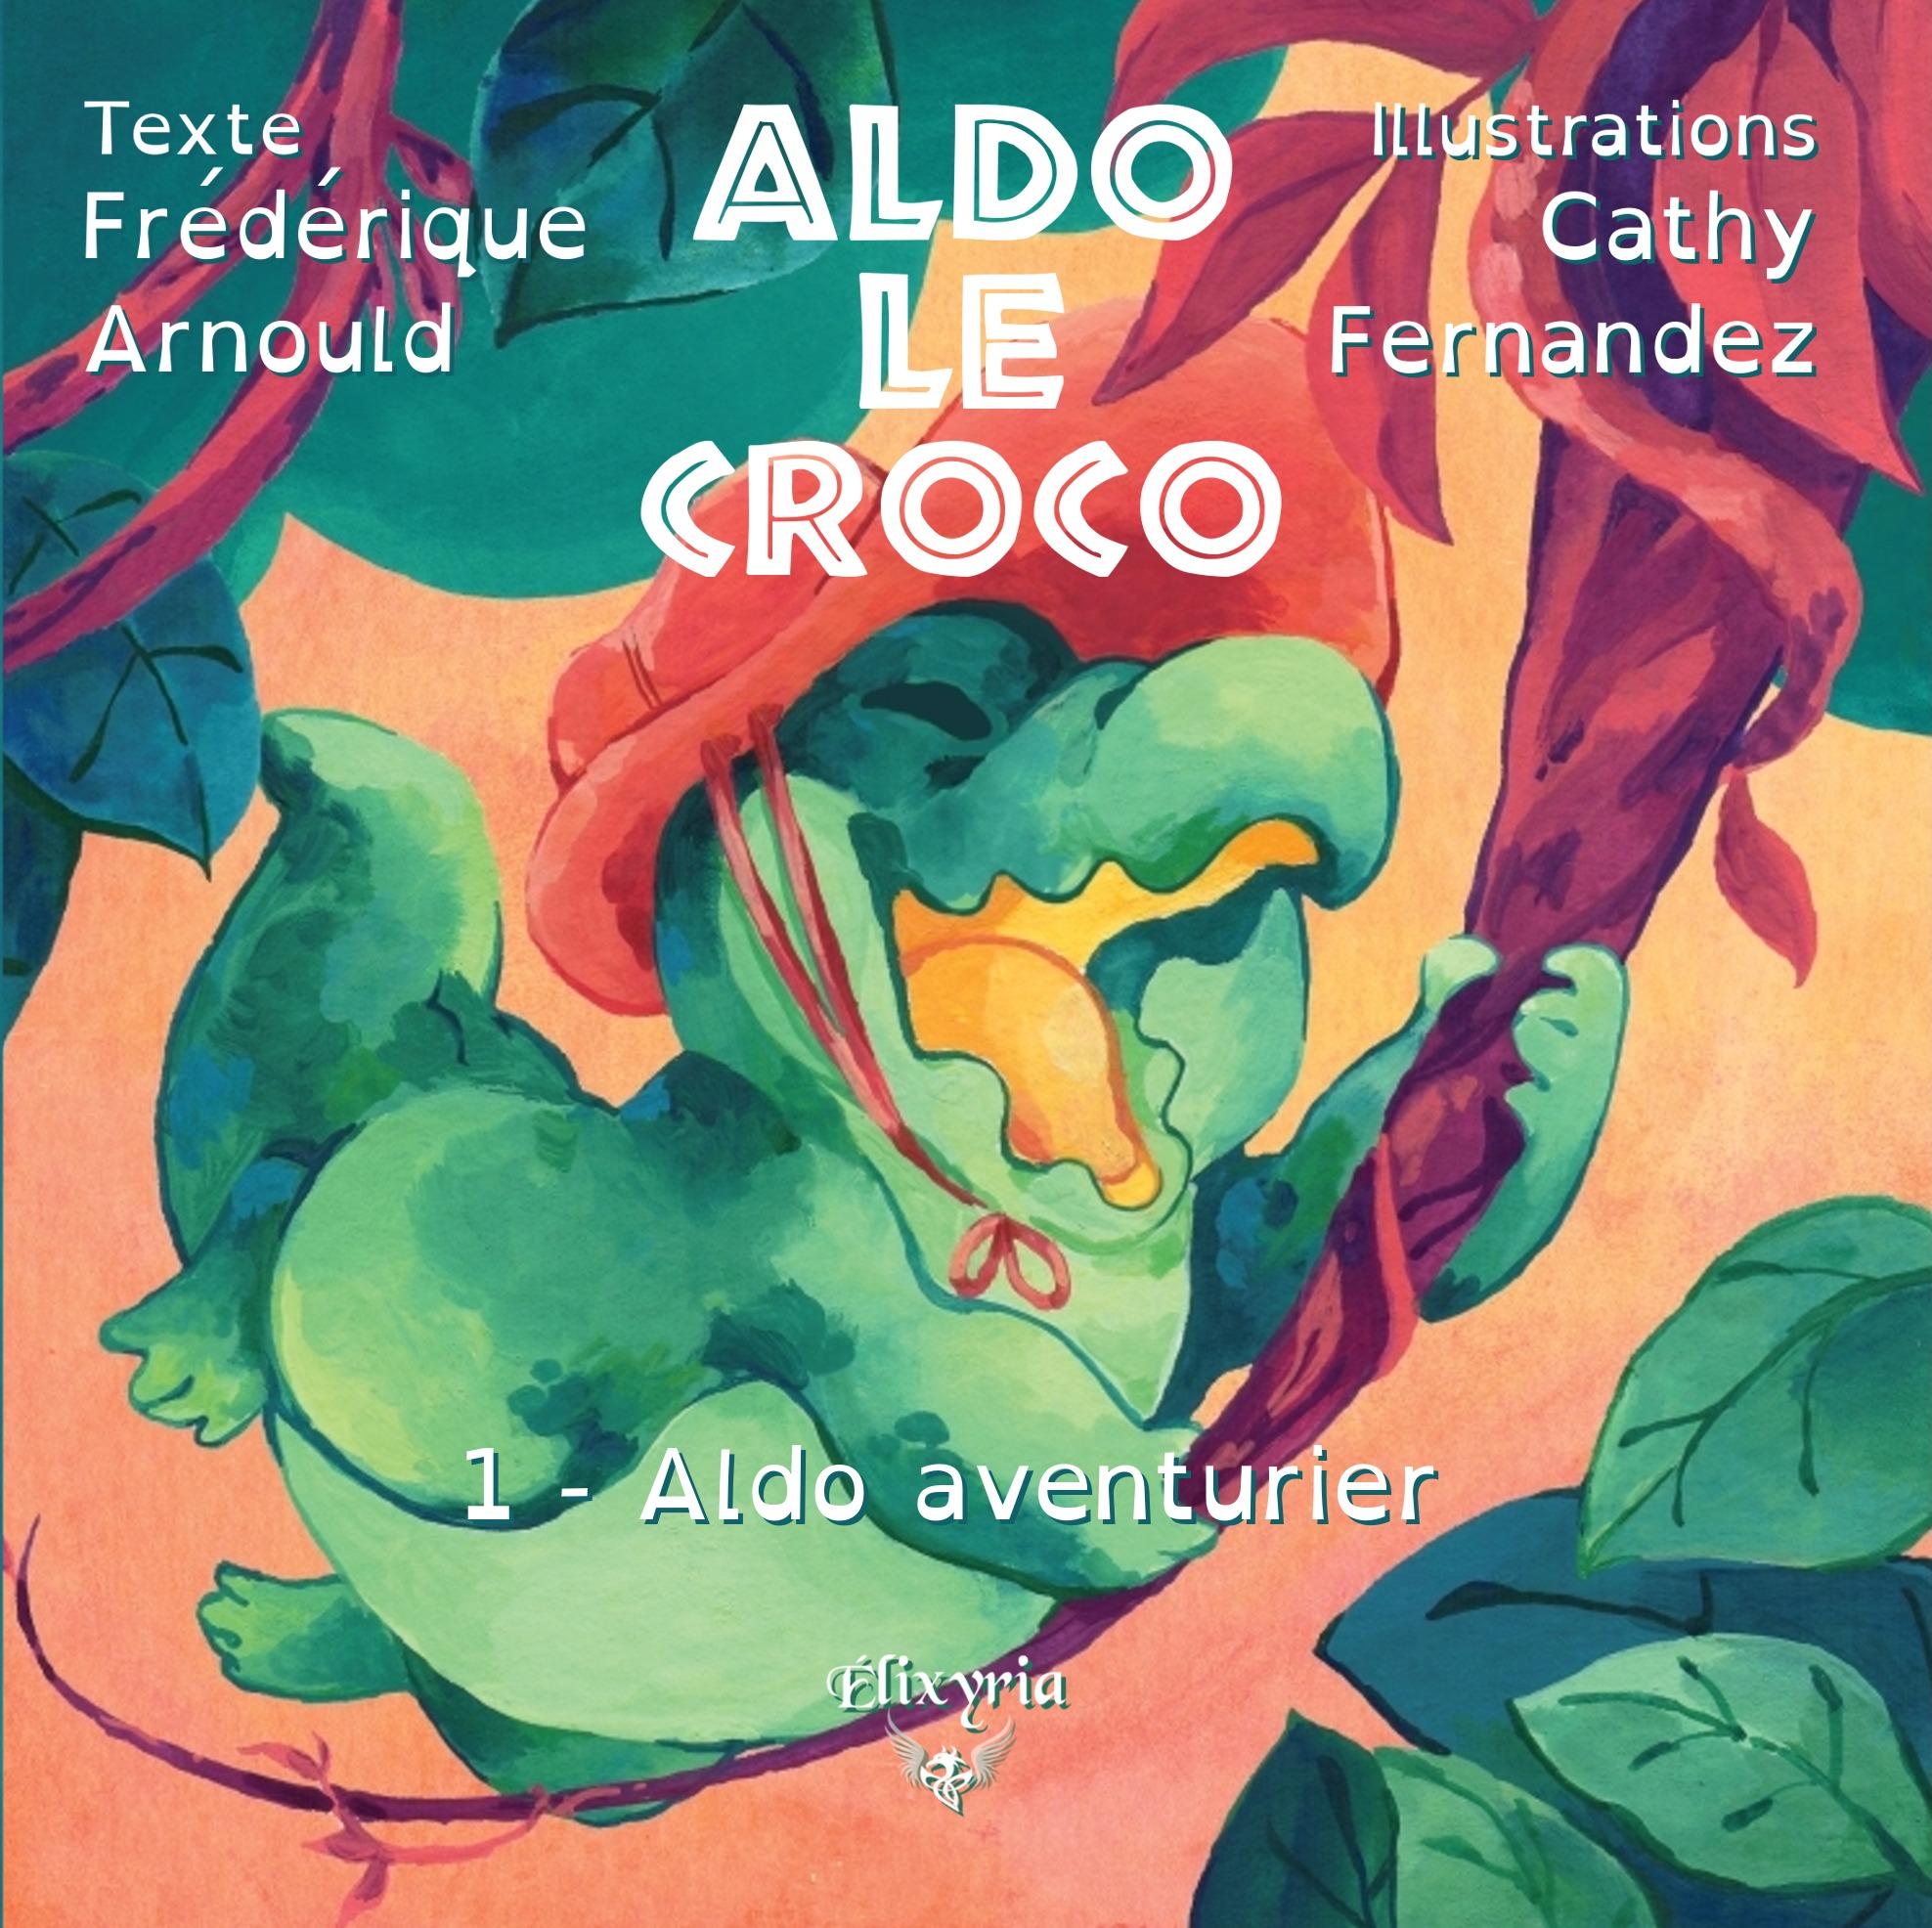 Aldo le croco